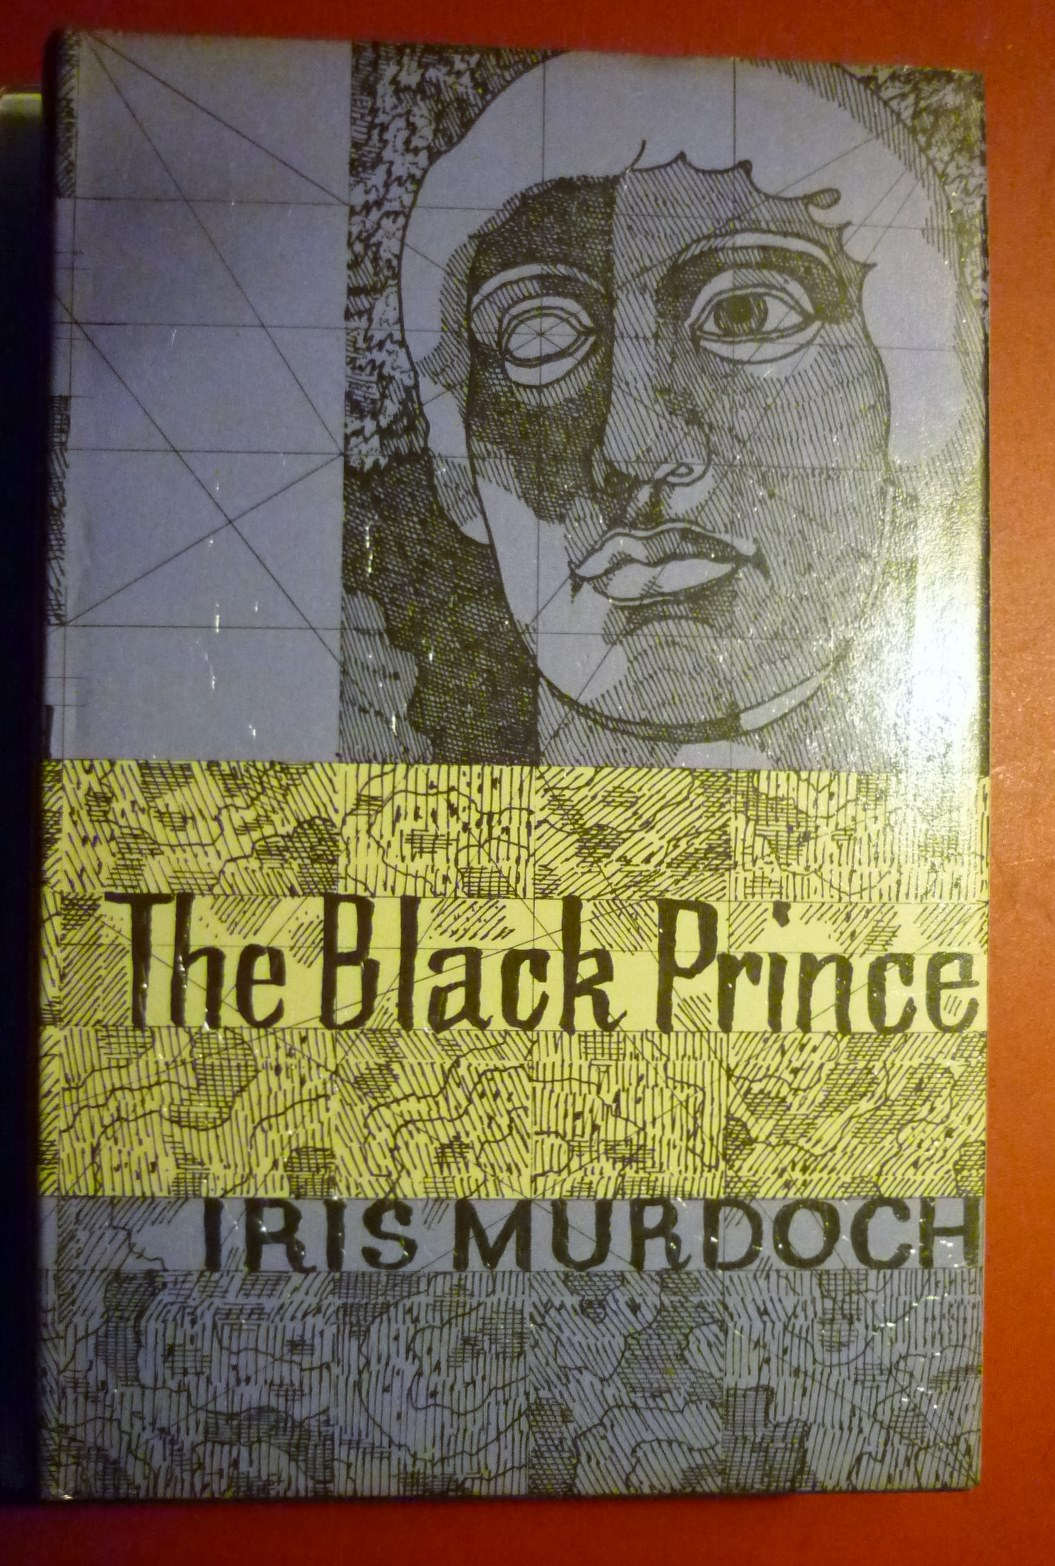 Iris Murdoch:  The BlackPrince